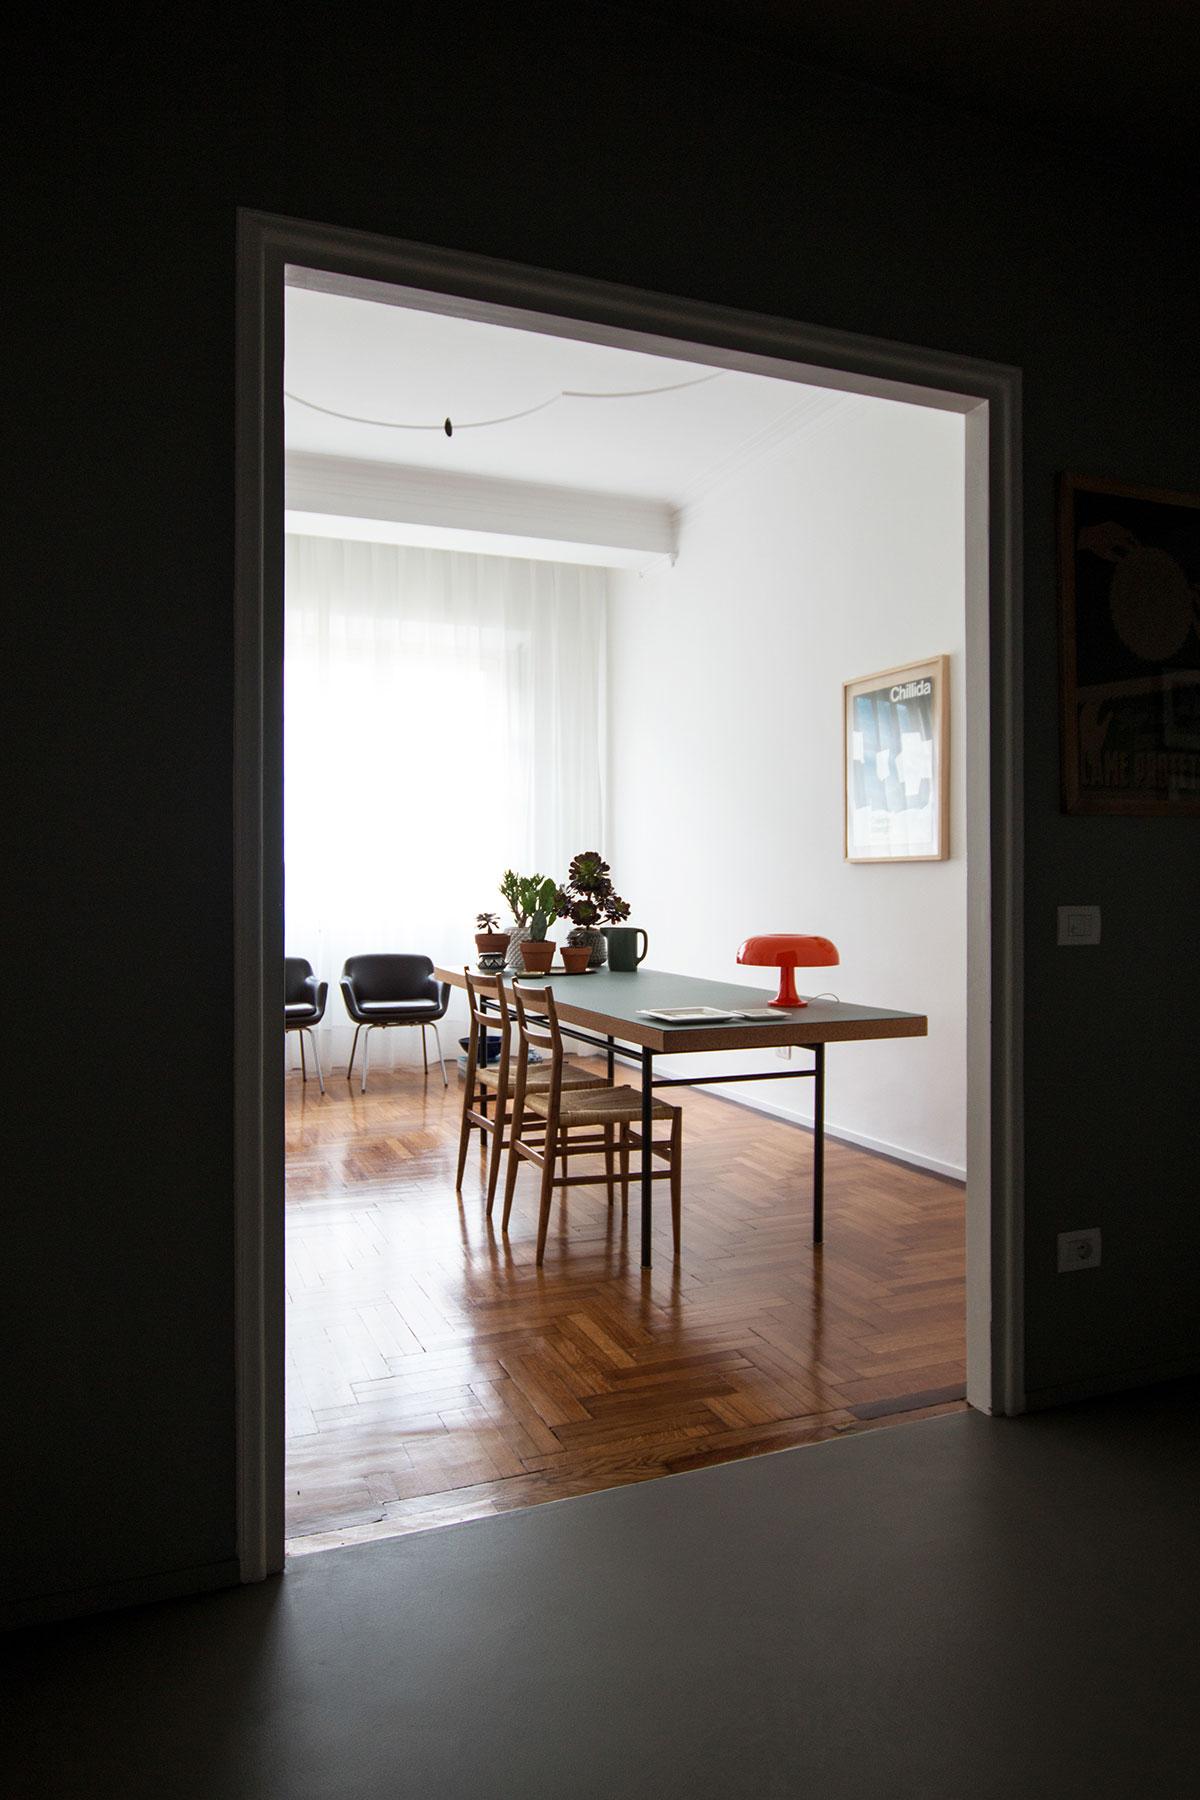 kickoffice casa a hallway entrance opening livingroom